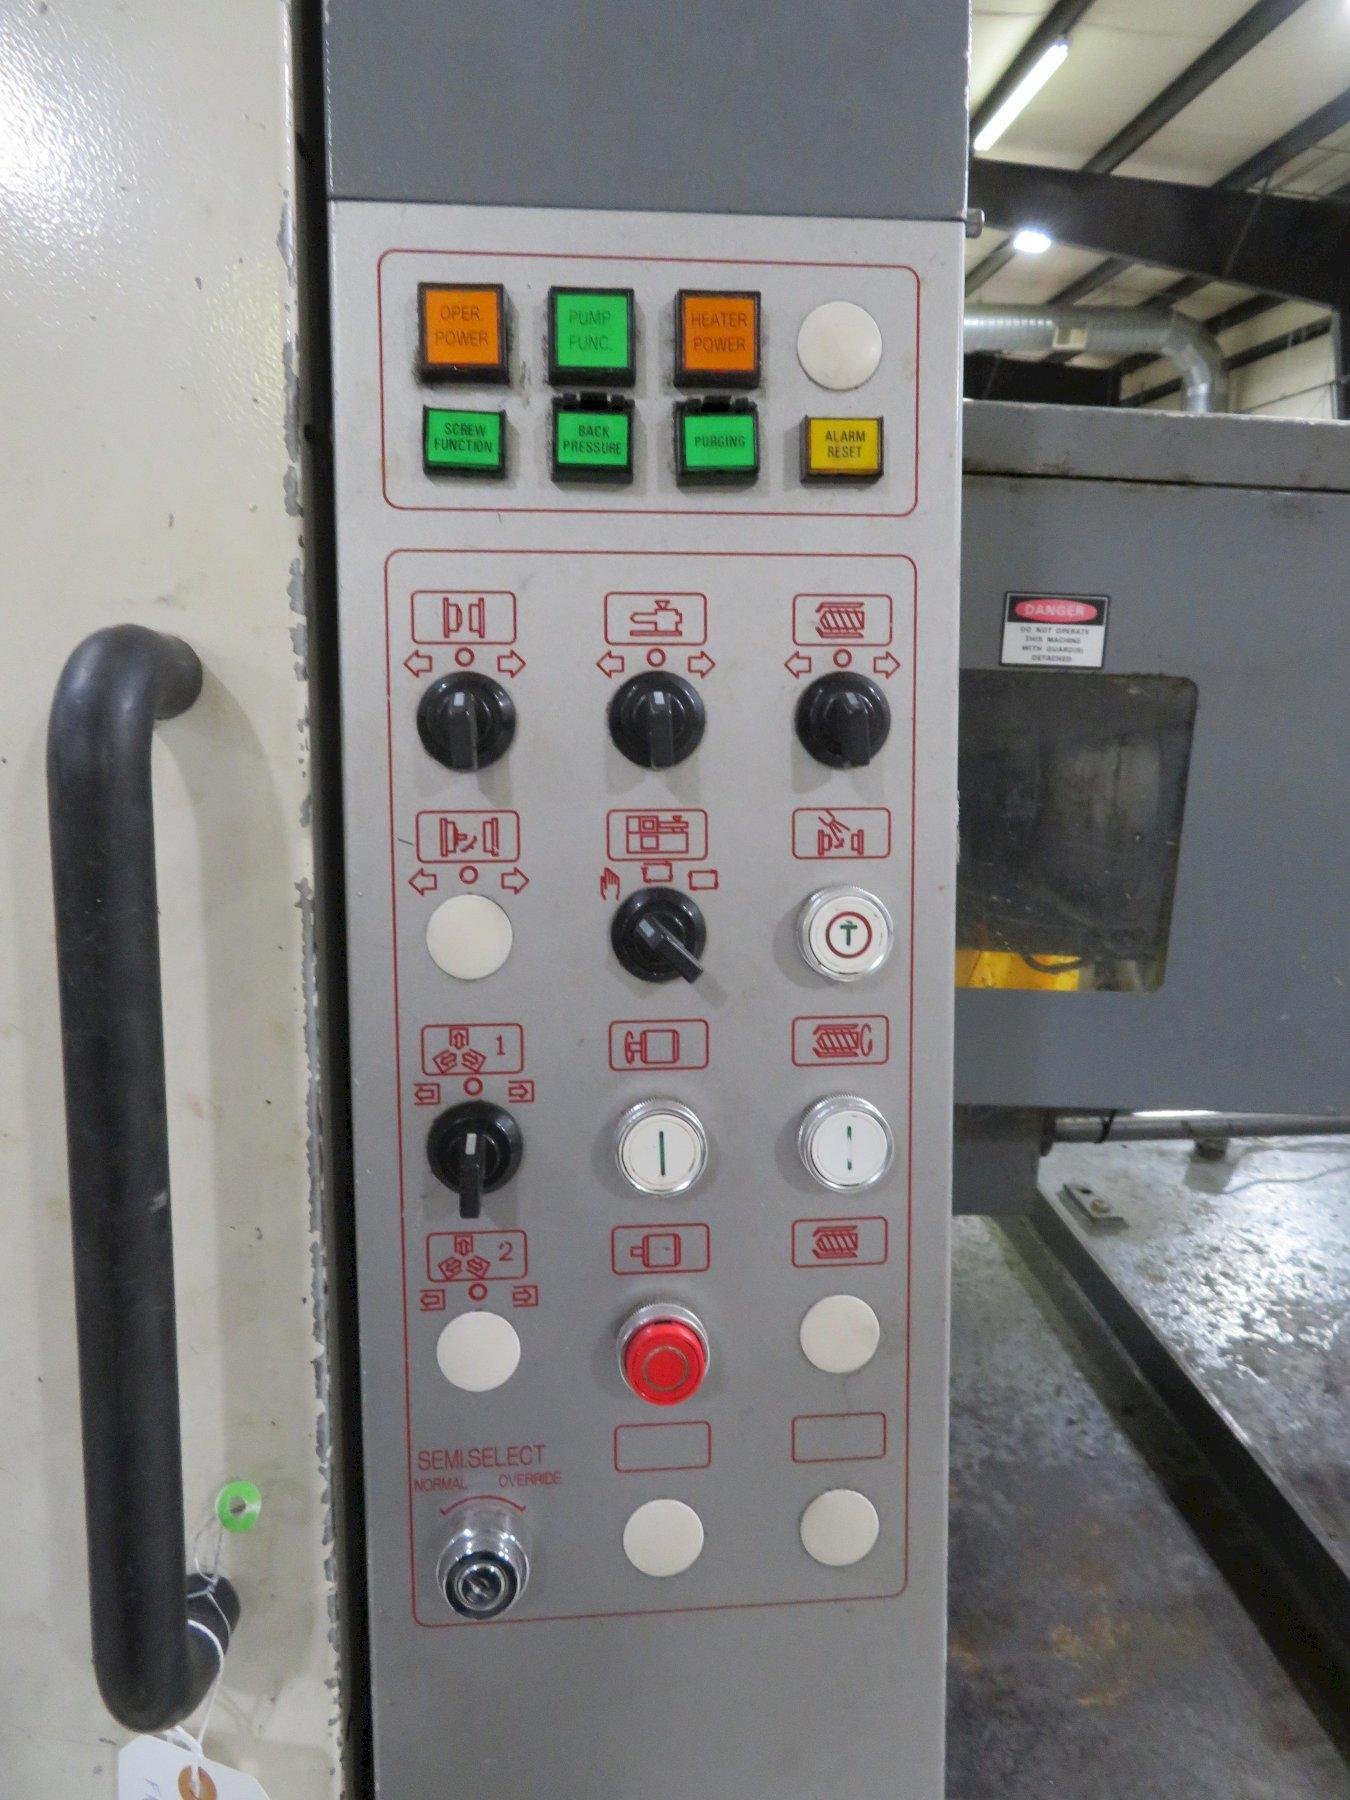 Nissei Used FN5000 Injection Molding Machine, 240 US ton, Yr. 2000, 21.4 oz.